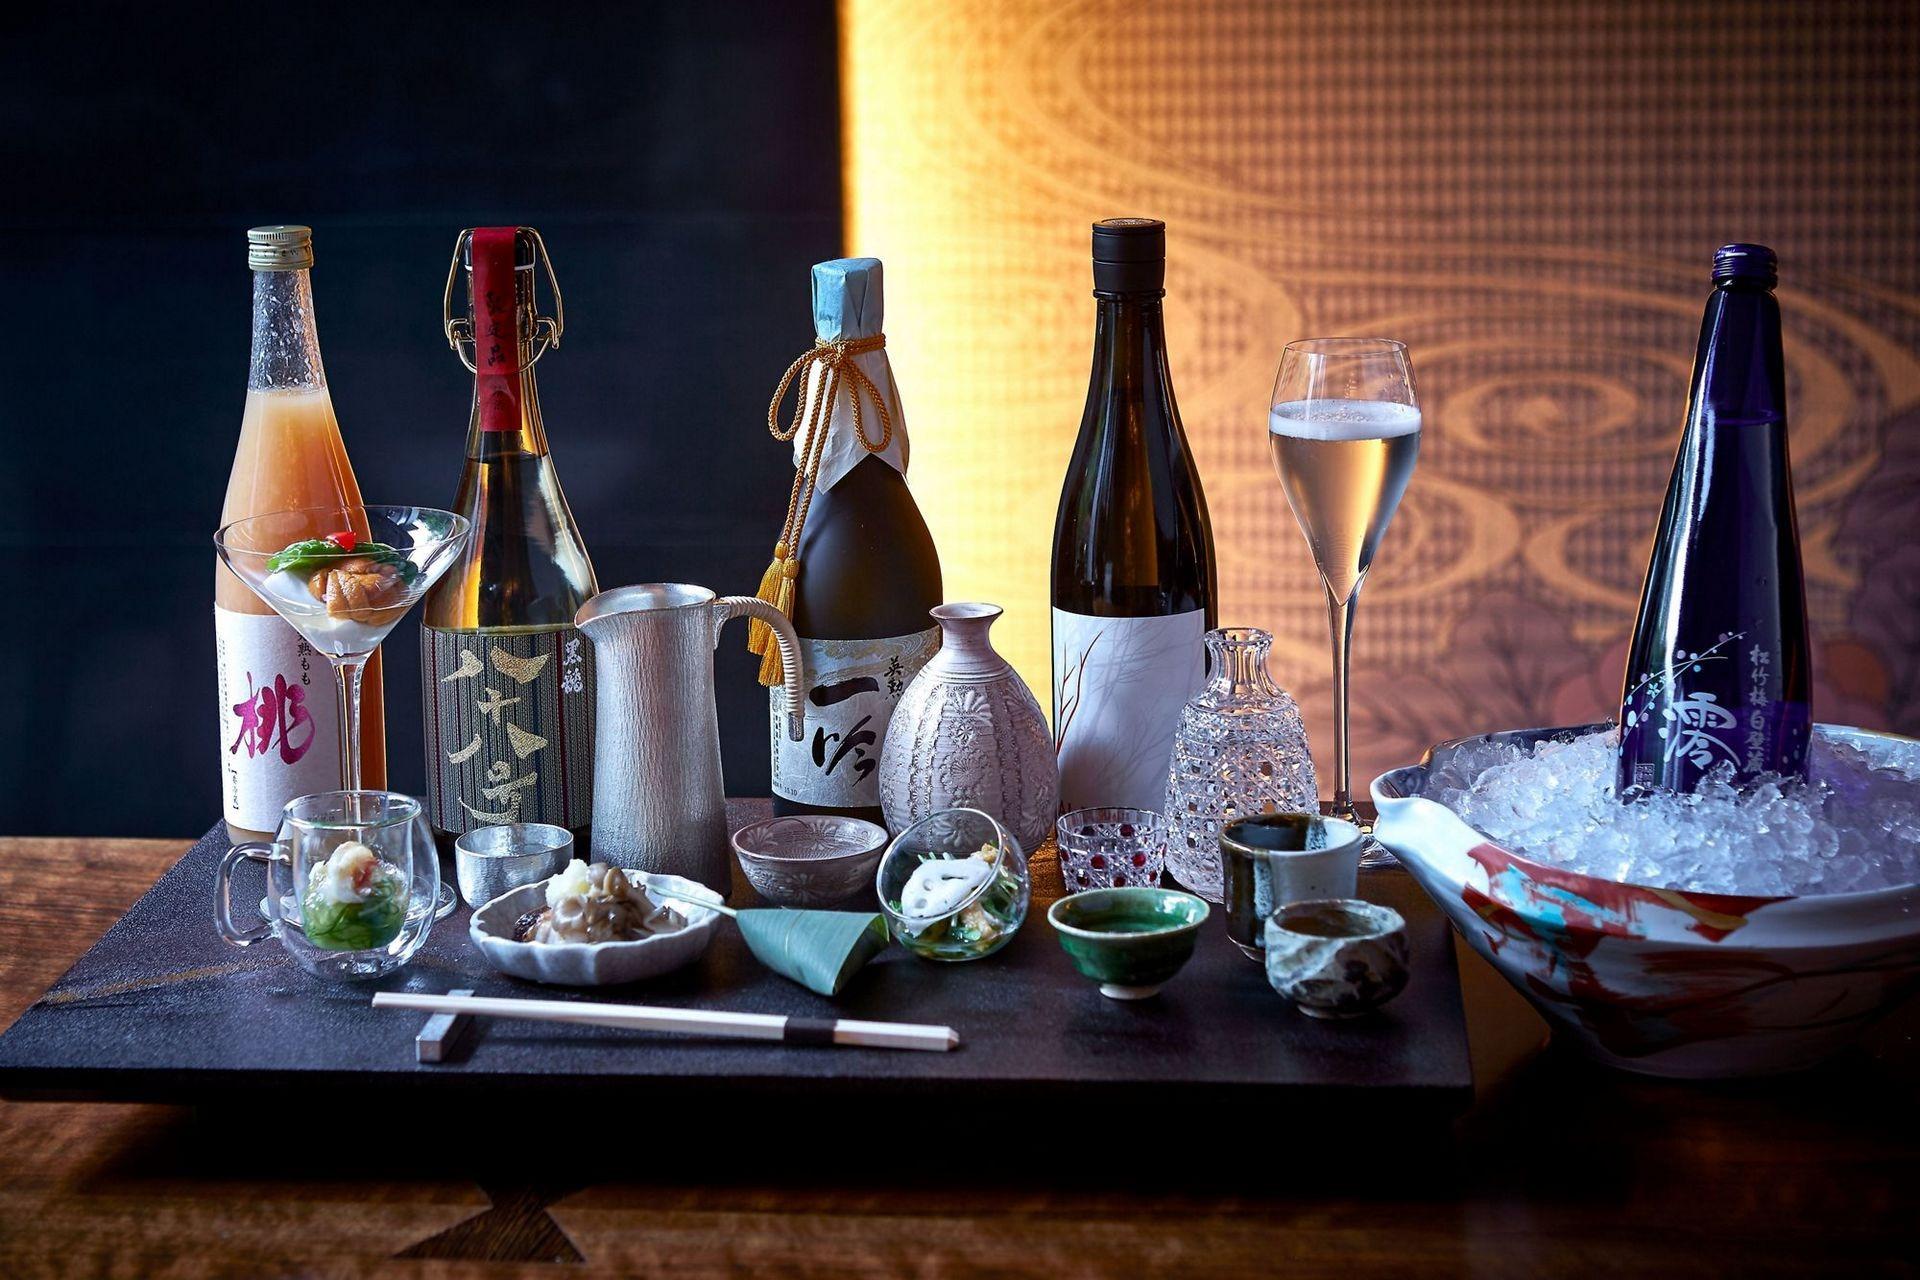 29-str-środek-Degustacja-Sake-The-Ritz-Carlton-Kioto